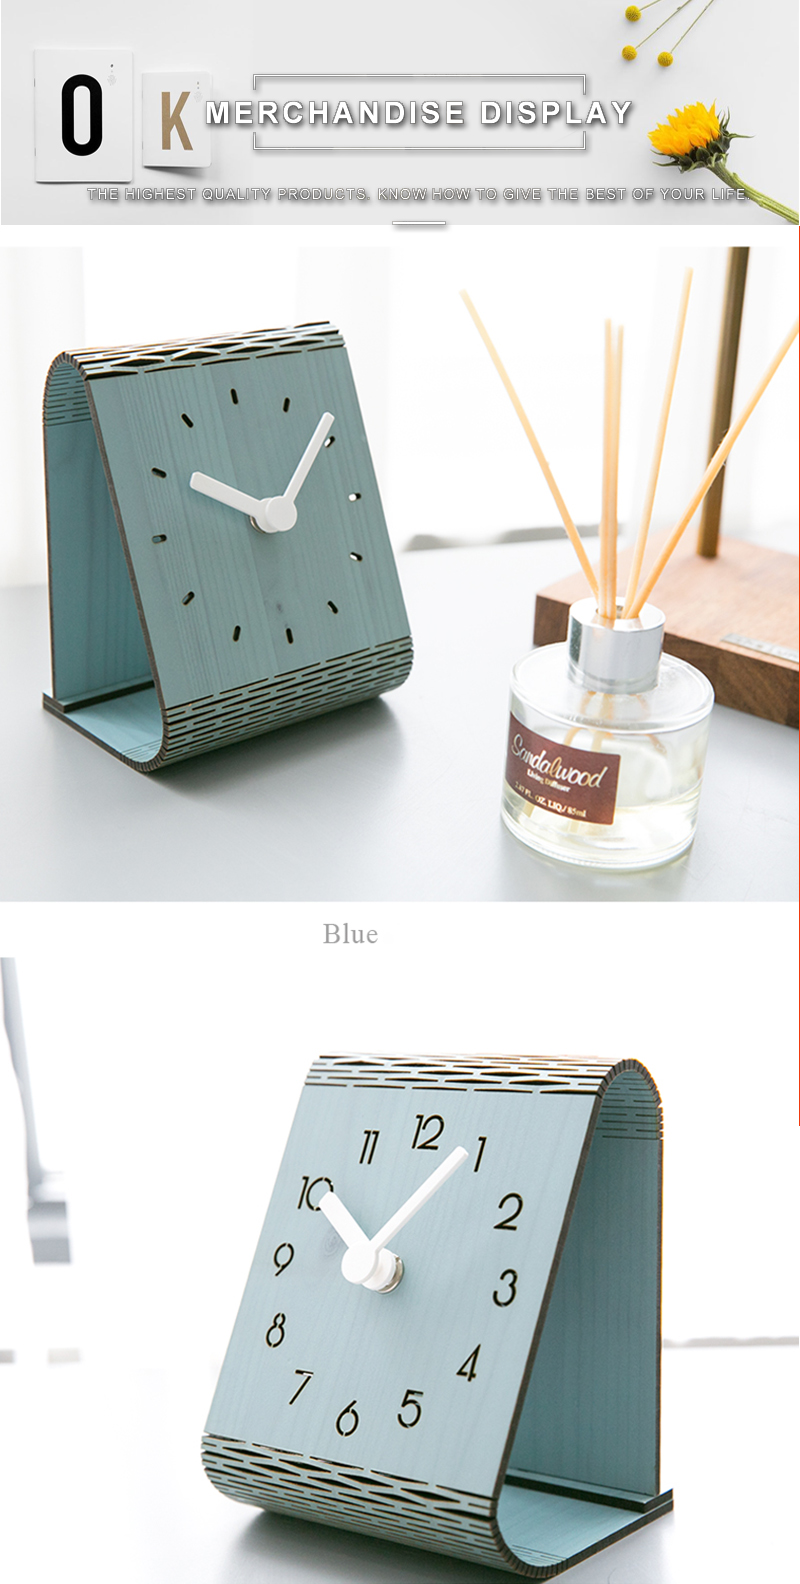 clock retro clock with time projection clock vintage automobile clock alarm clock bedroom clock clock flip watch table table clock vintage table clocks office decoration (3)